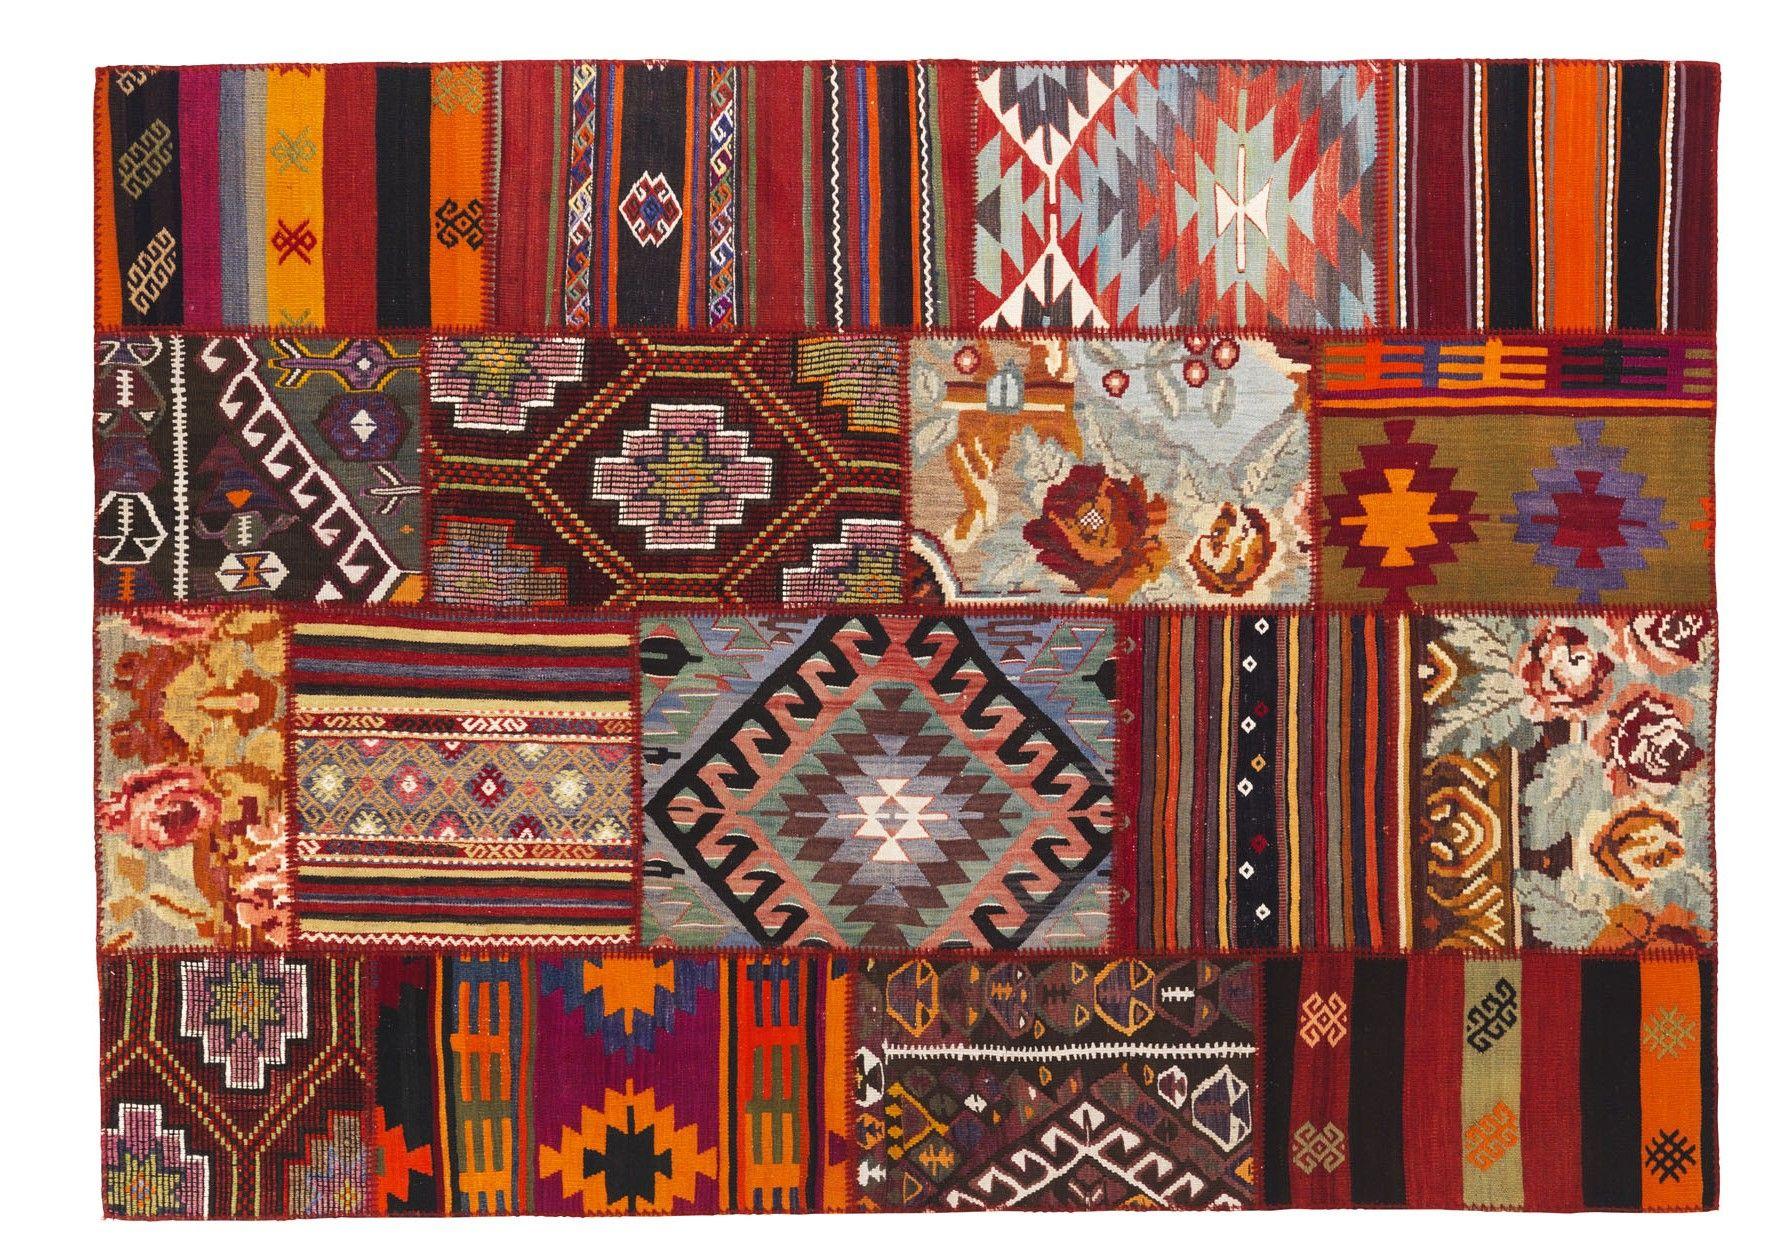 Turkse Tapijten Ikea Uniek Vintage Kleed Tapijt